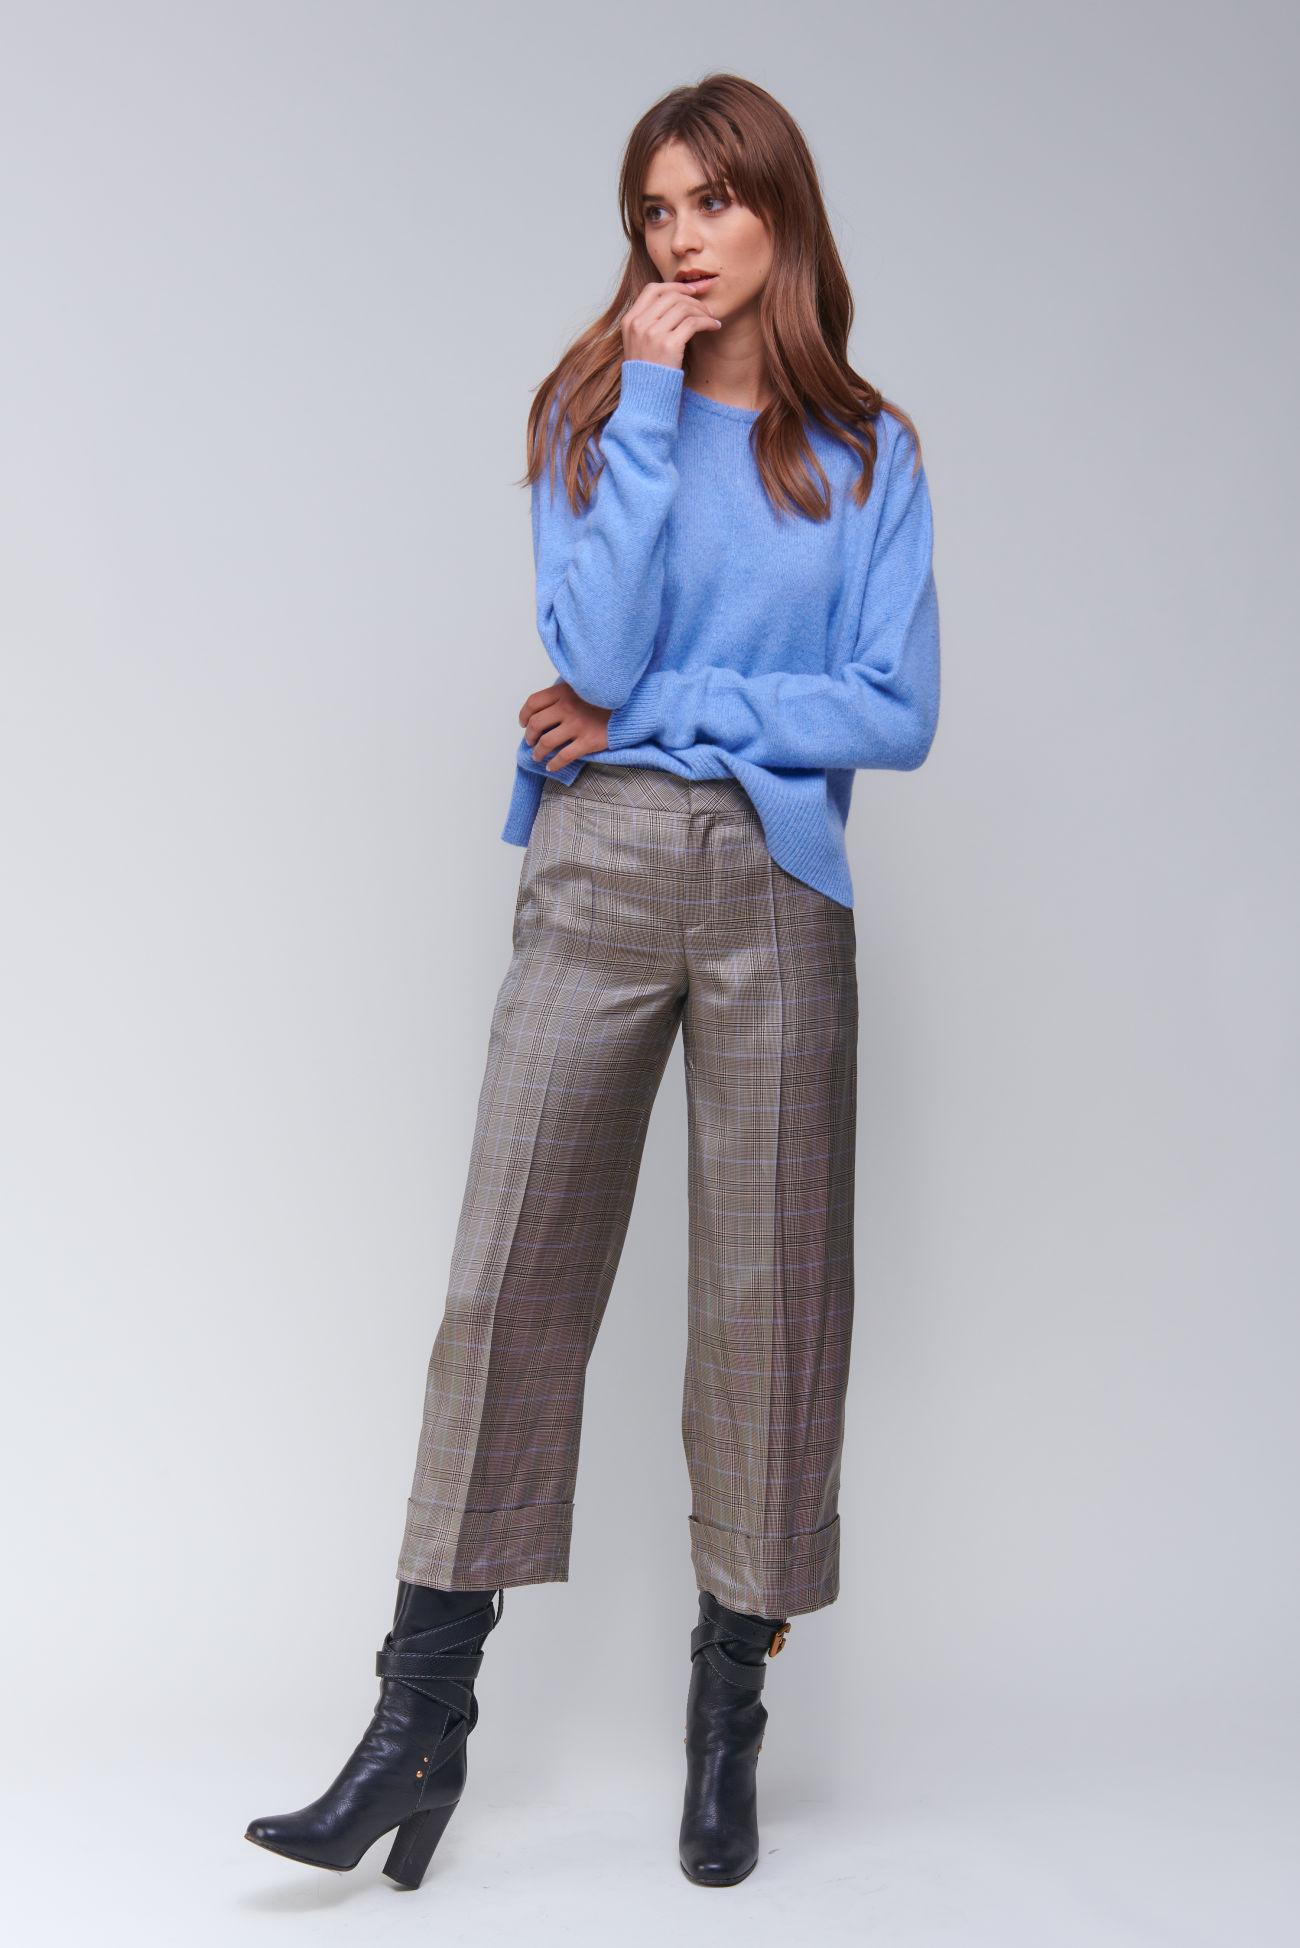 Culotte trousers in Glencheck design